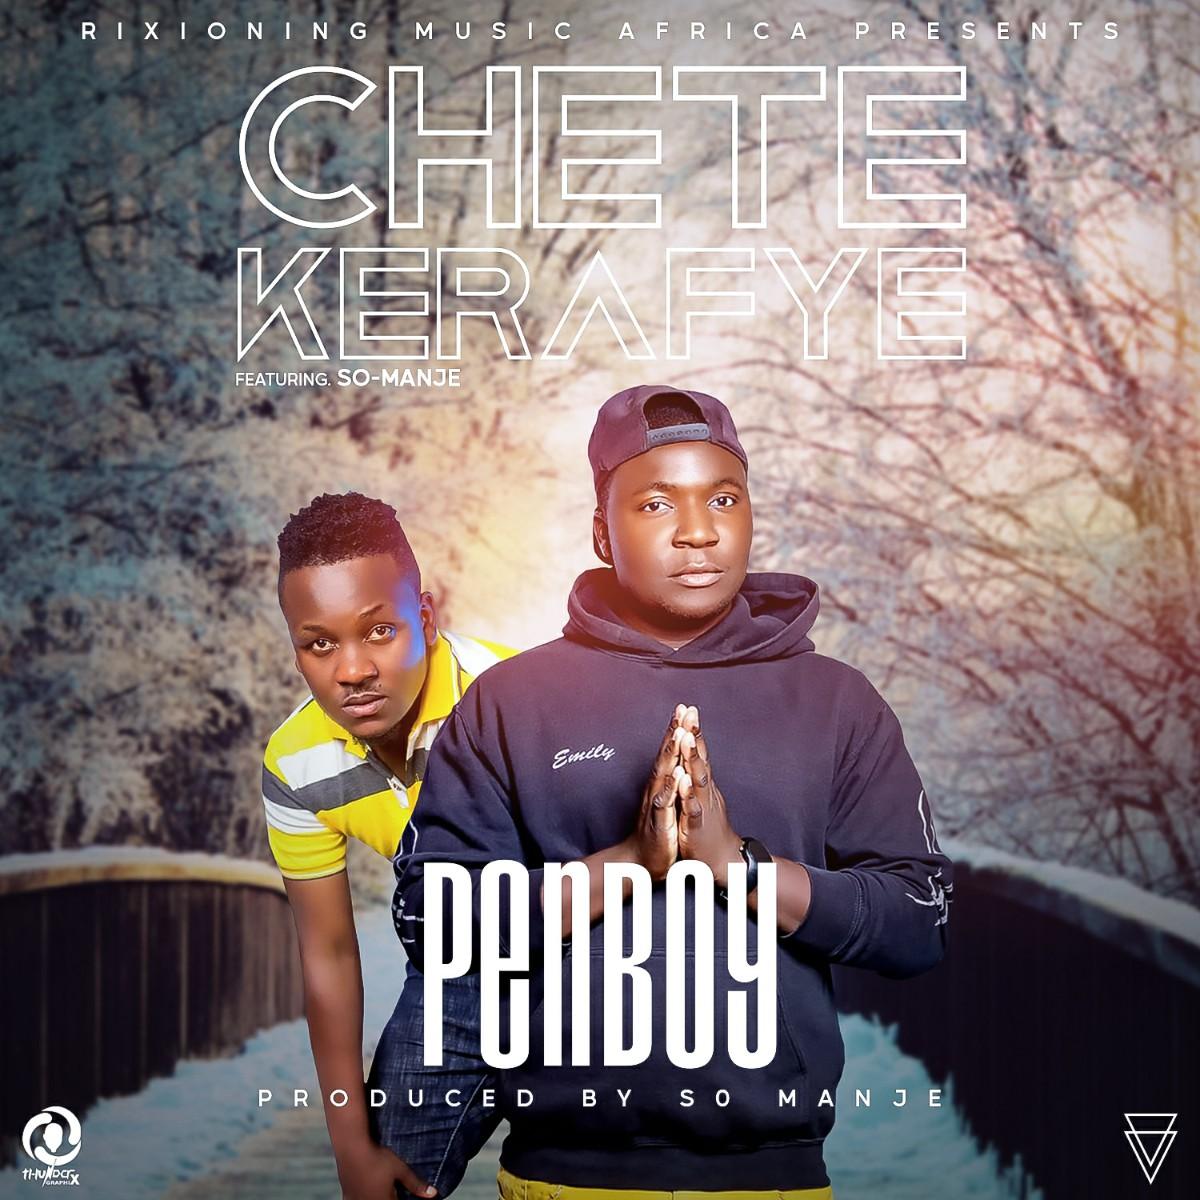 Penboy ft. So-Manje - Chetekelafye